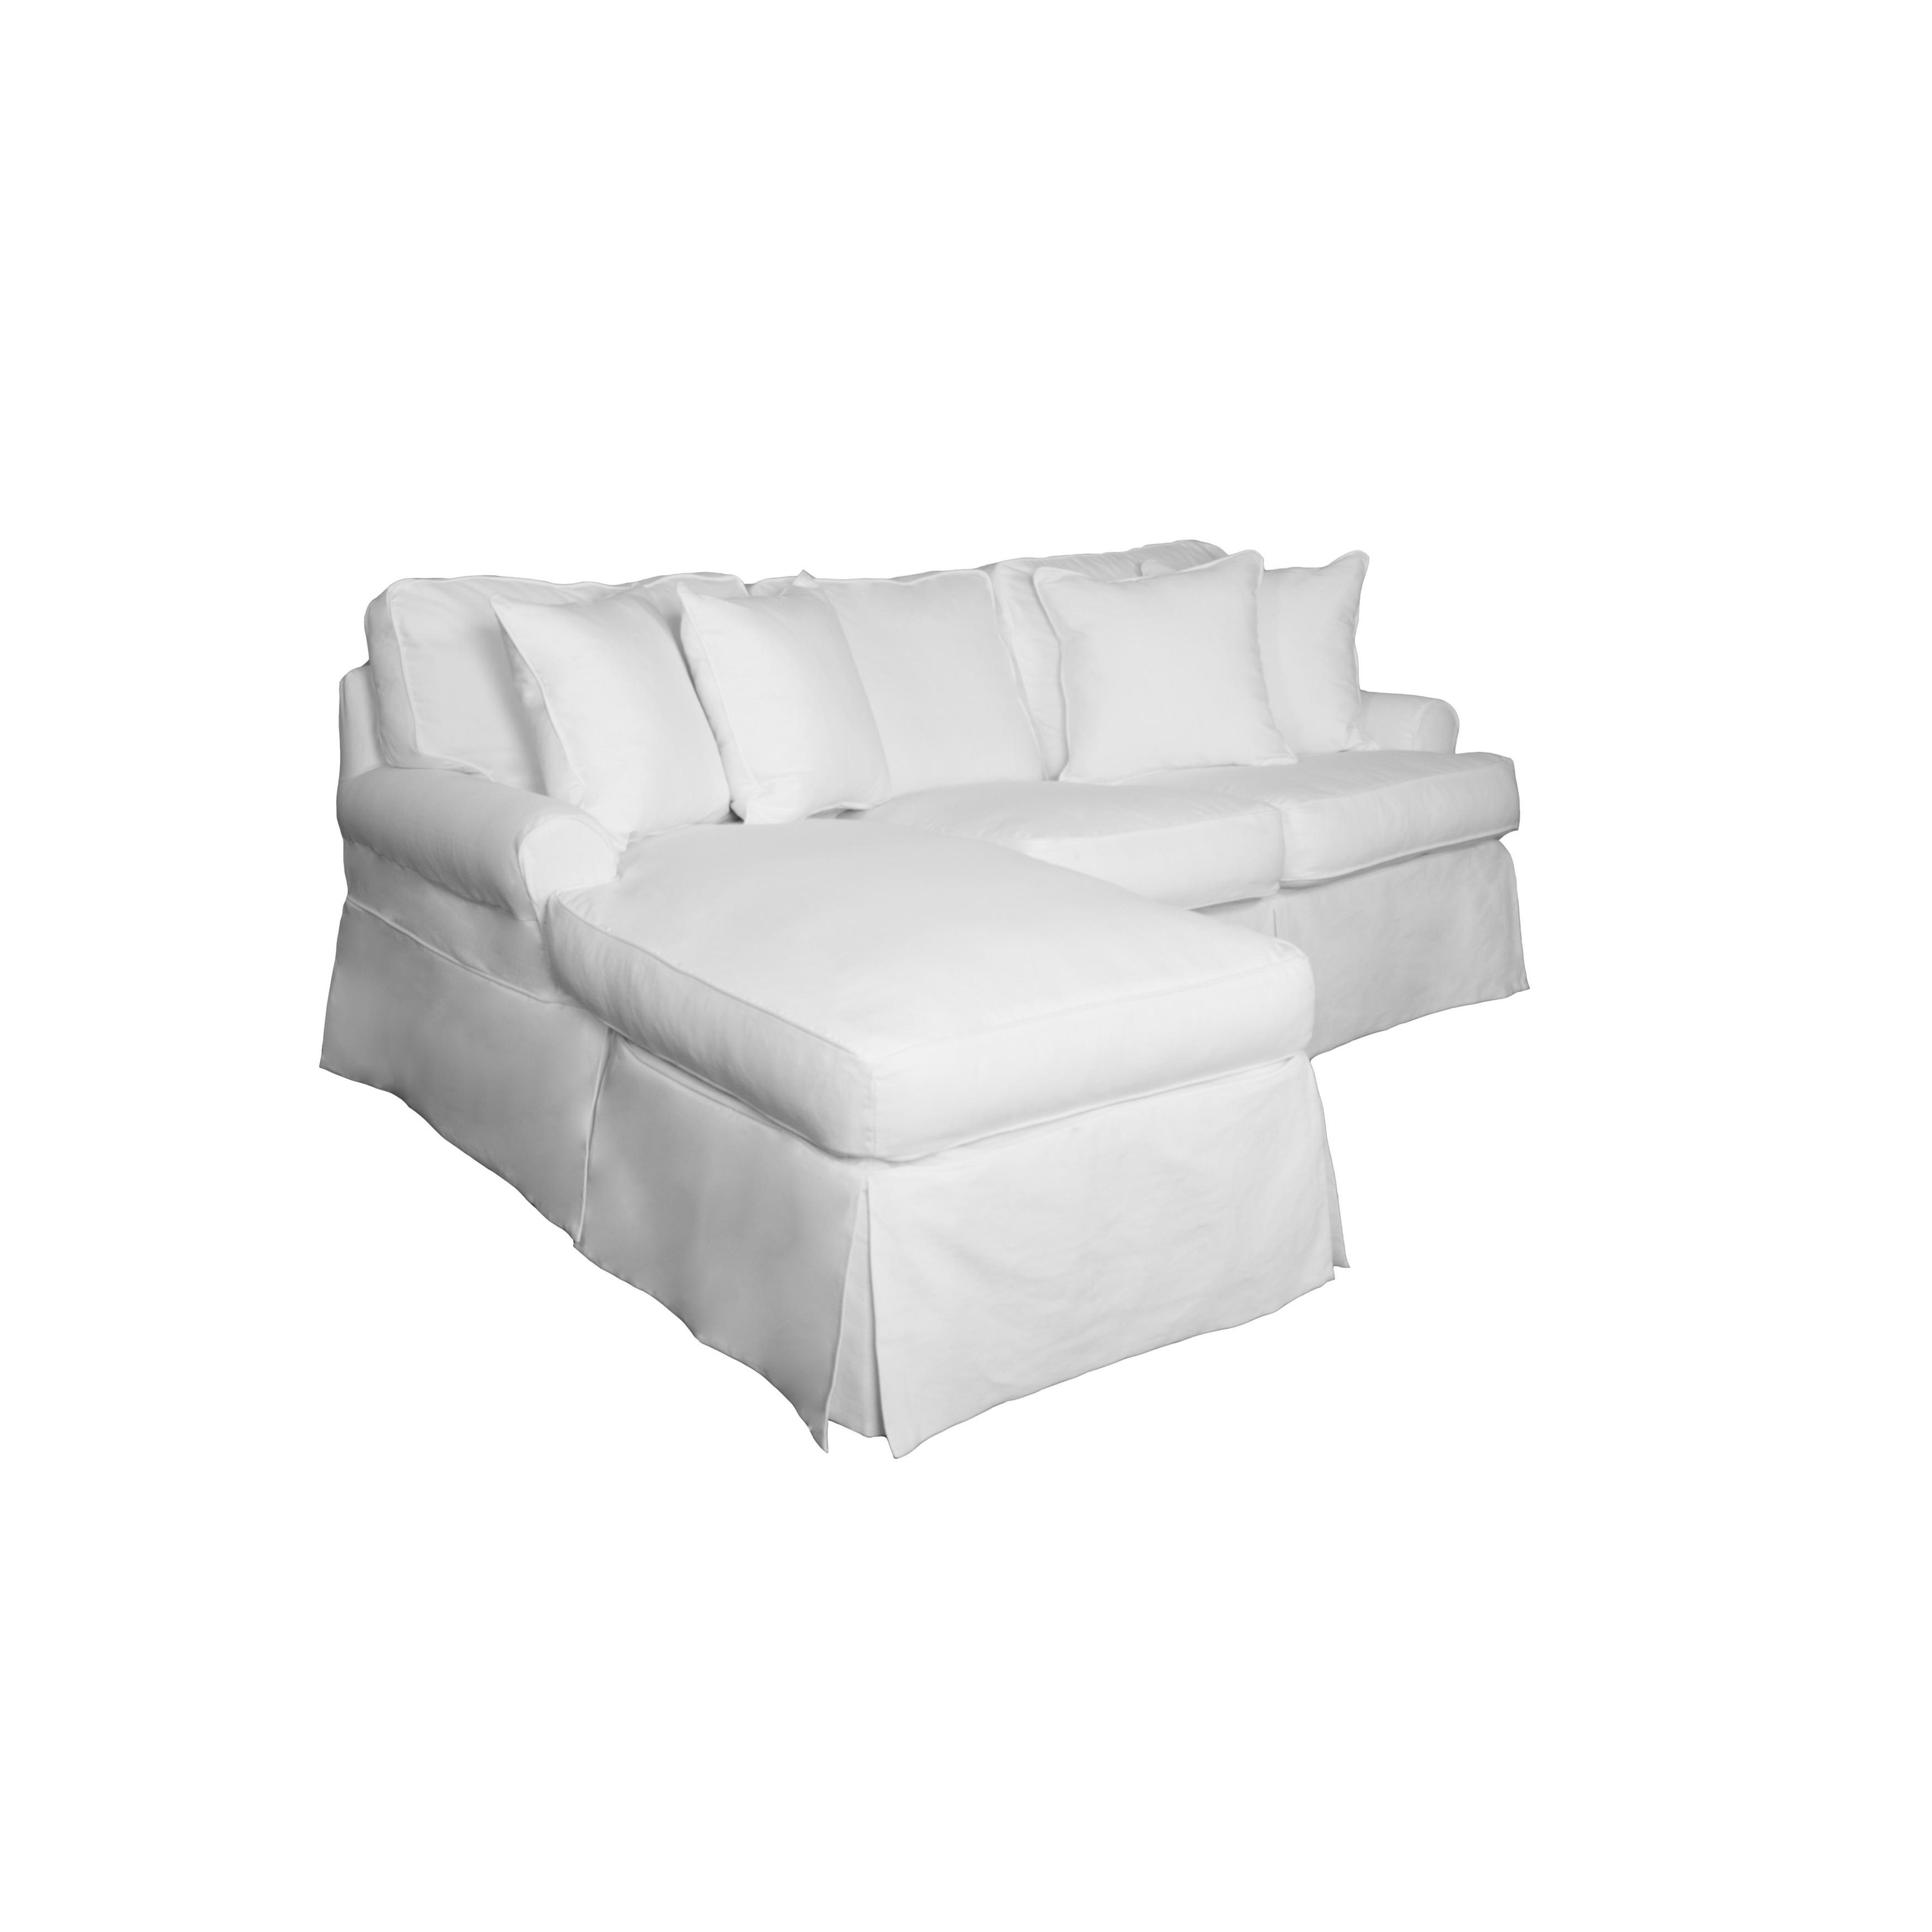 Sunset Trading Horizon Sectional Sofa Slipcover White Cover Only